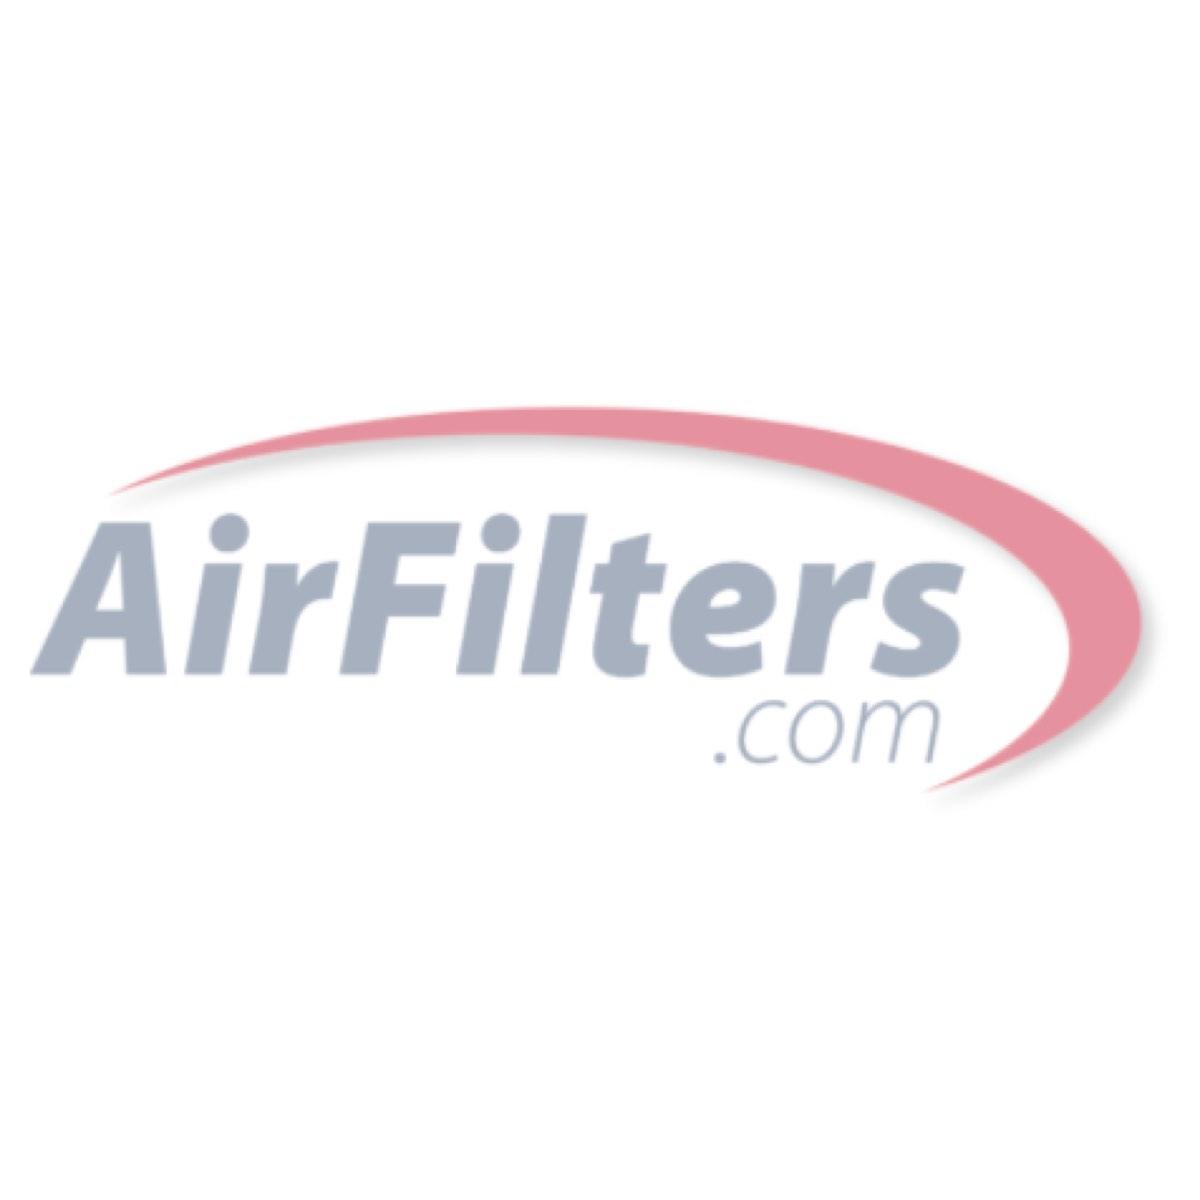 Accumulair Gold MERV 8 Filters - 4 Inch